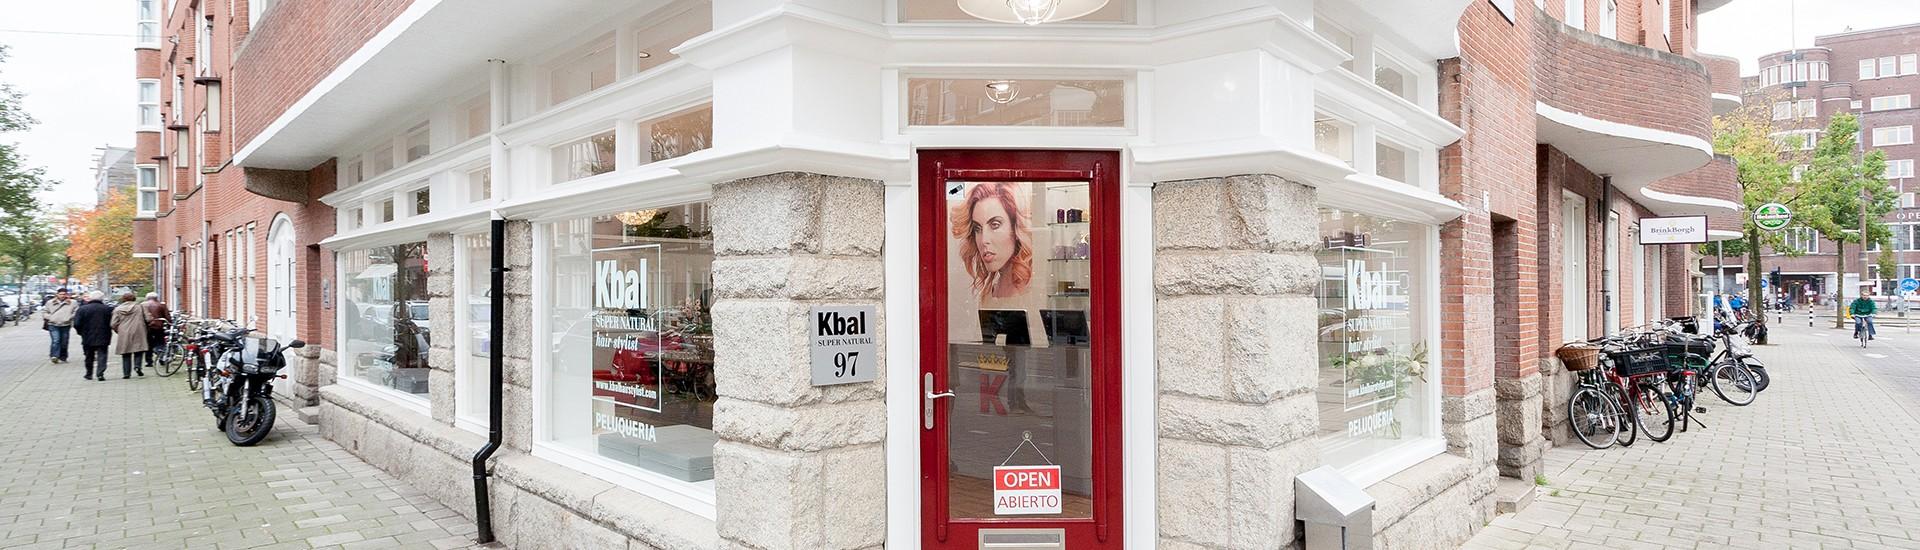 Kbal-hairstylist-Kapsalon-Amsterdam04